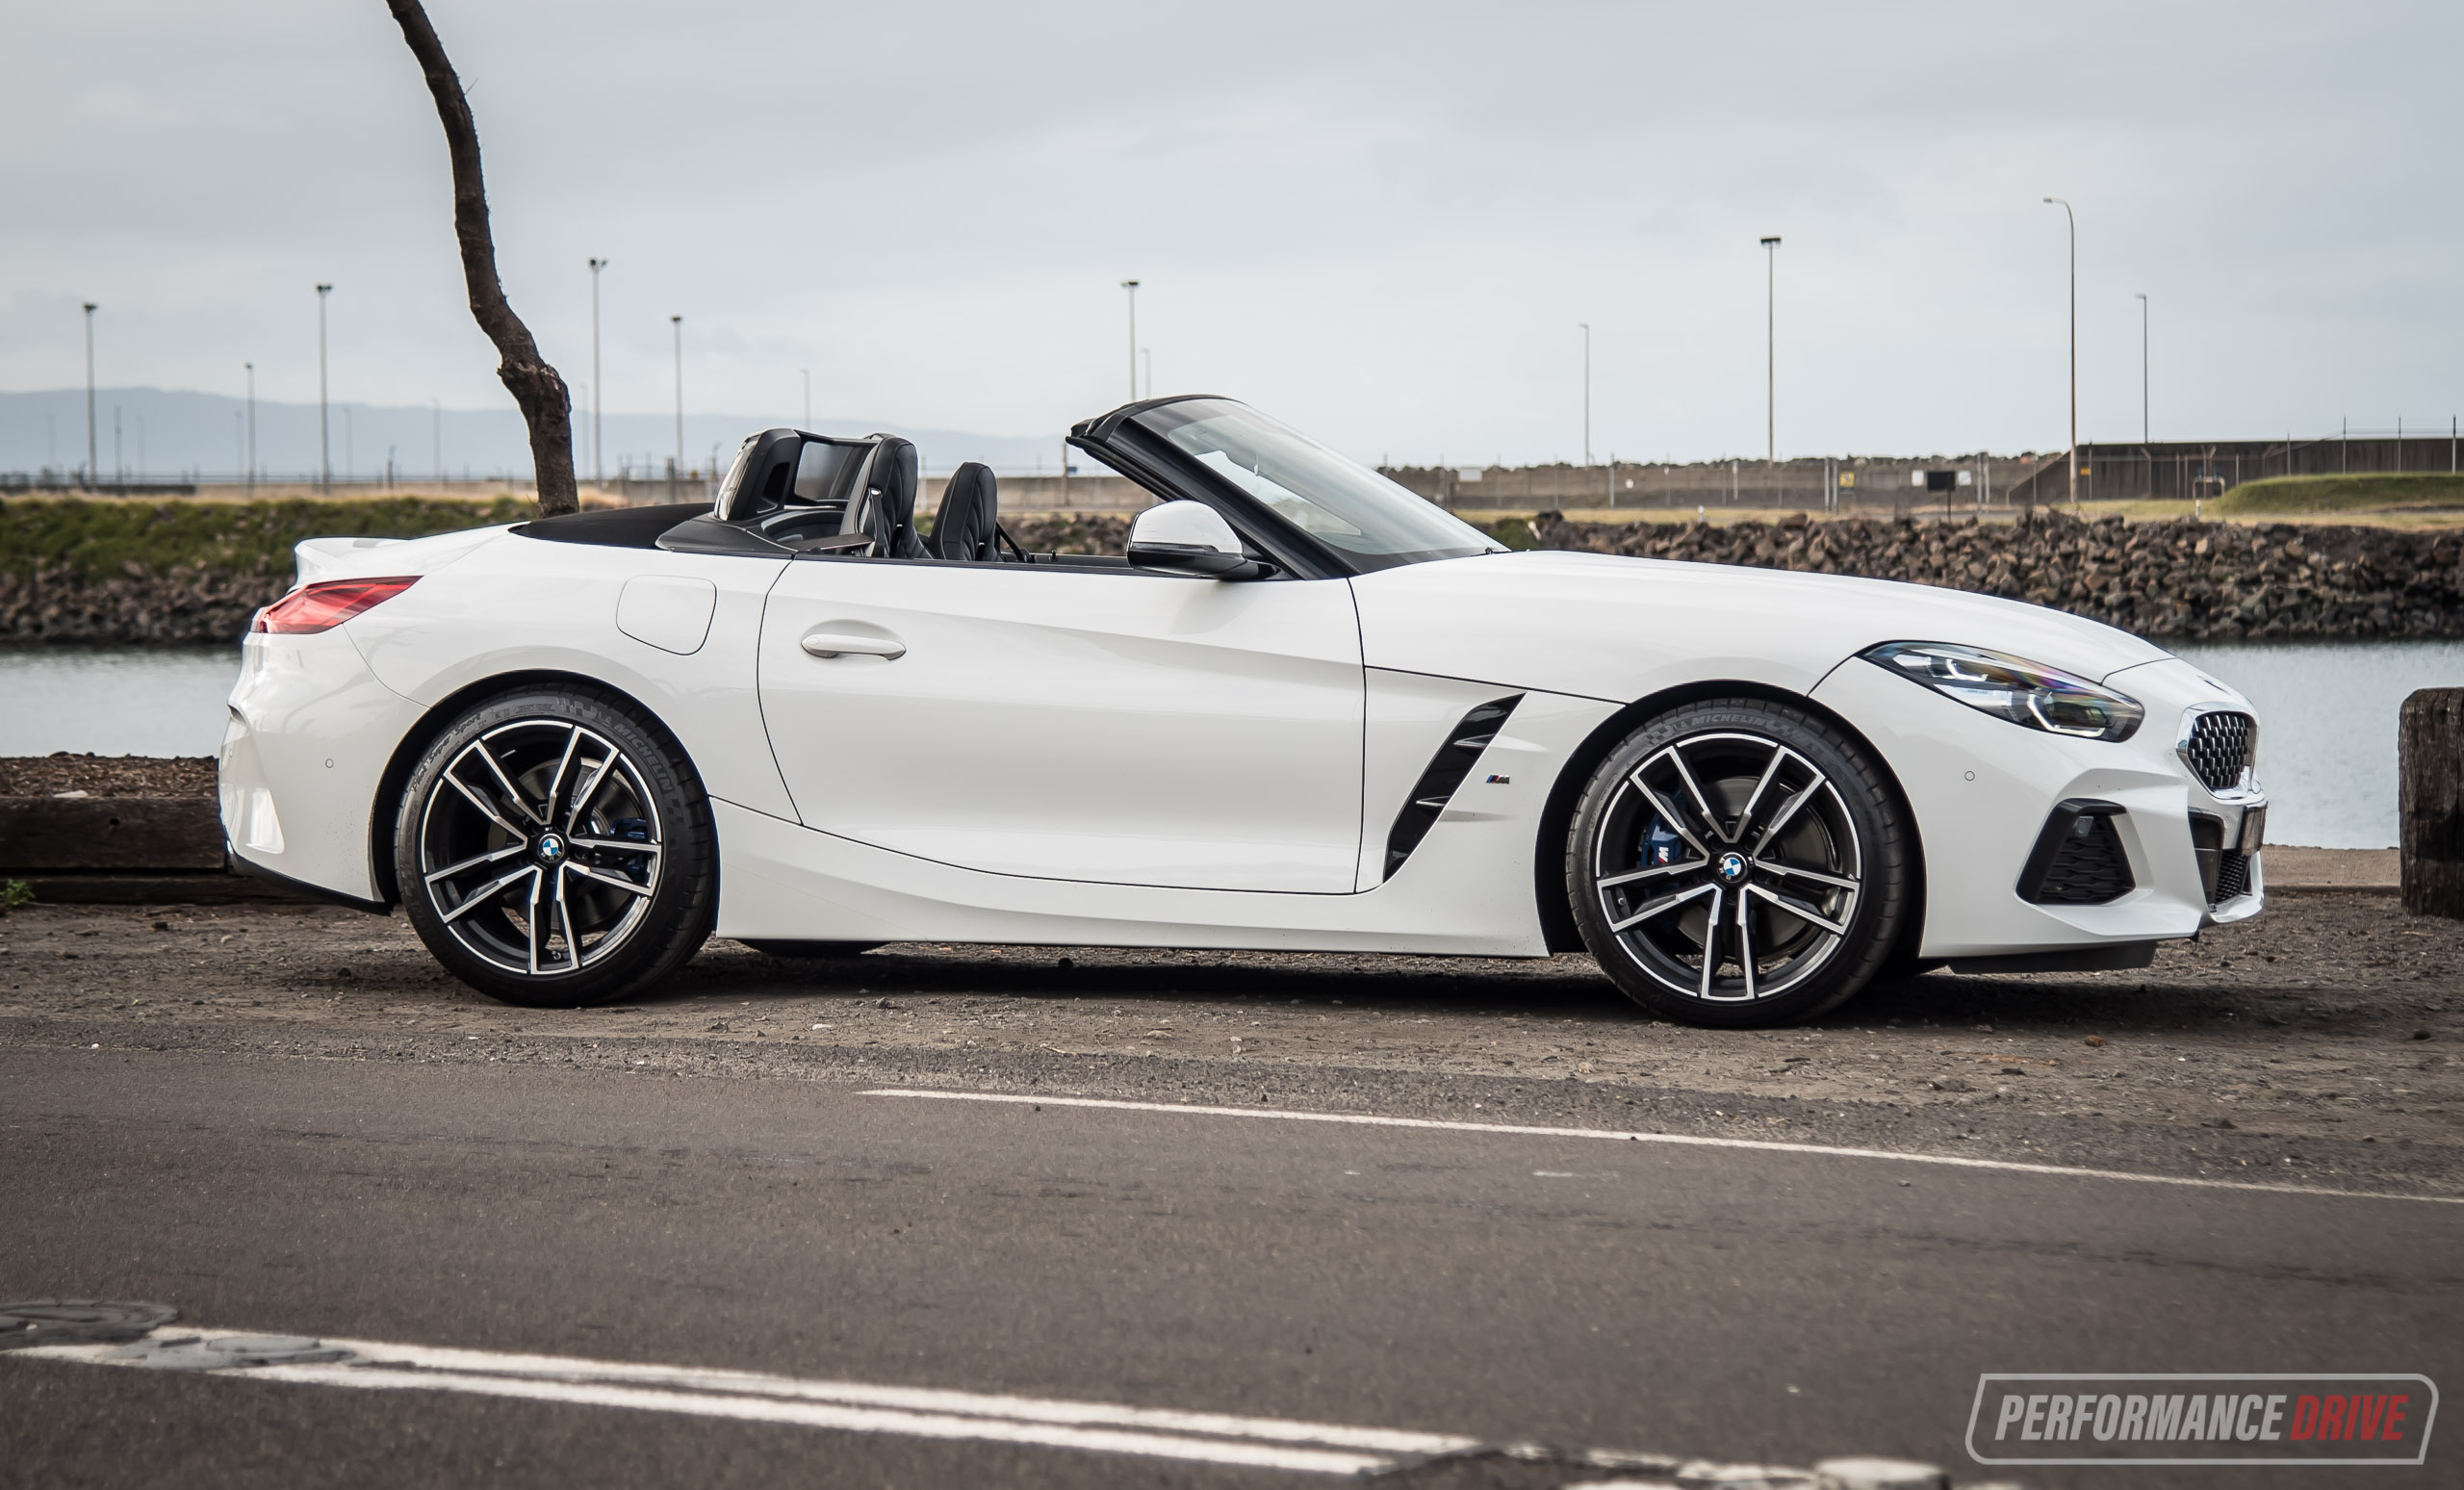 2020 BMW Z4 sDrive20i manual review (video) | PerformanceDrive